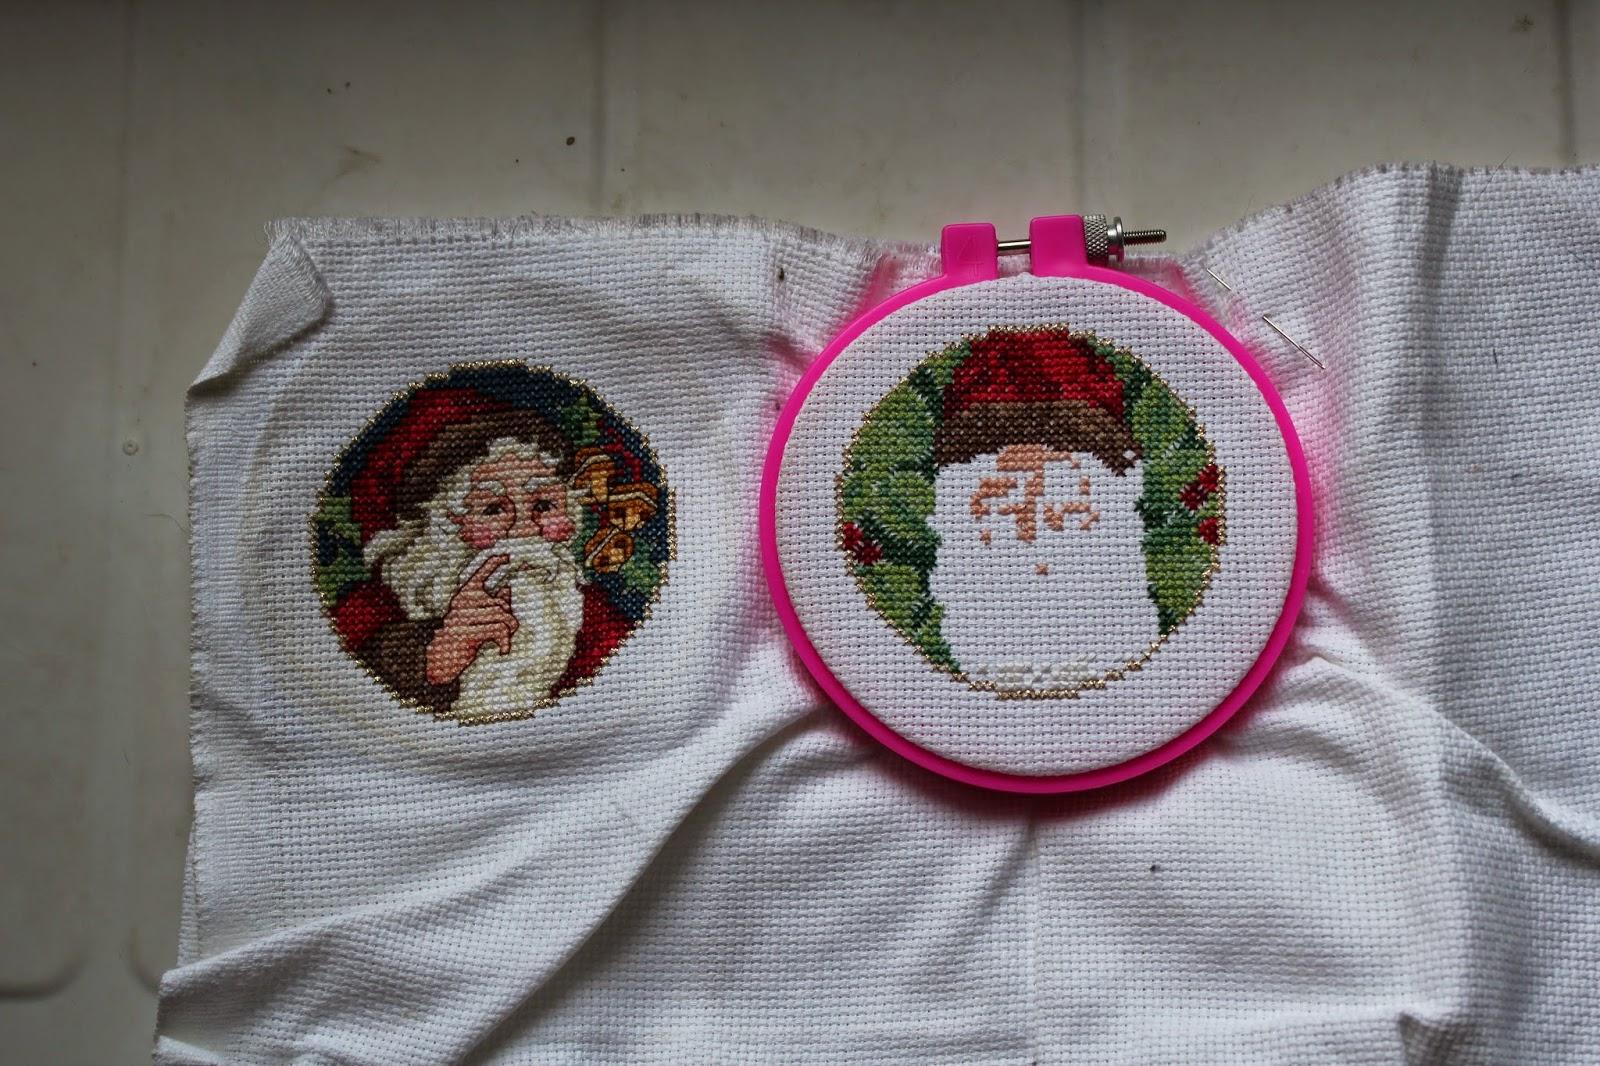 Half-finished Santa ornaments